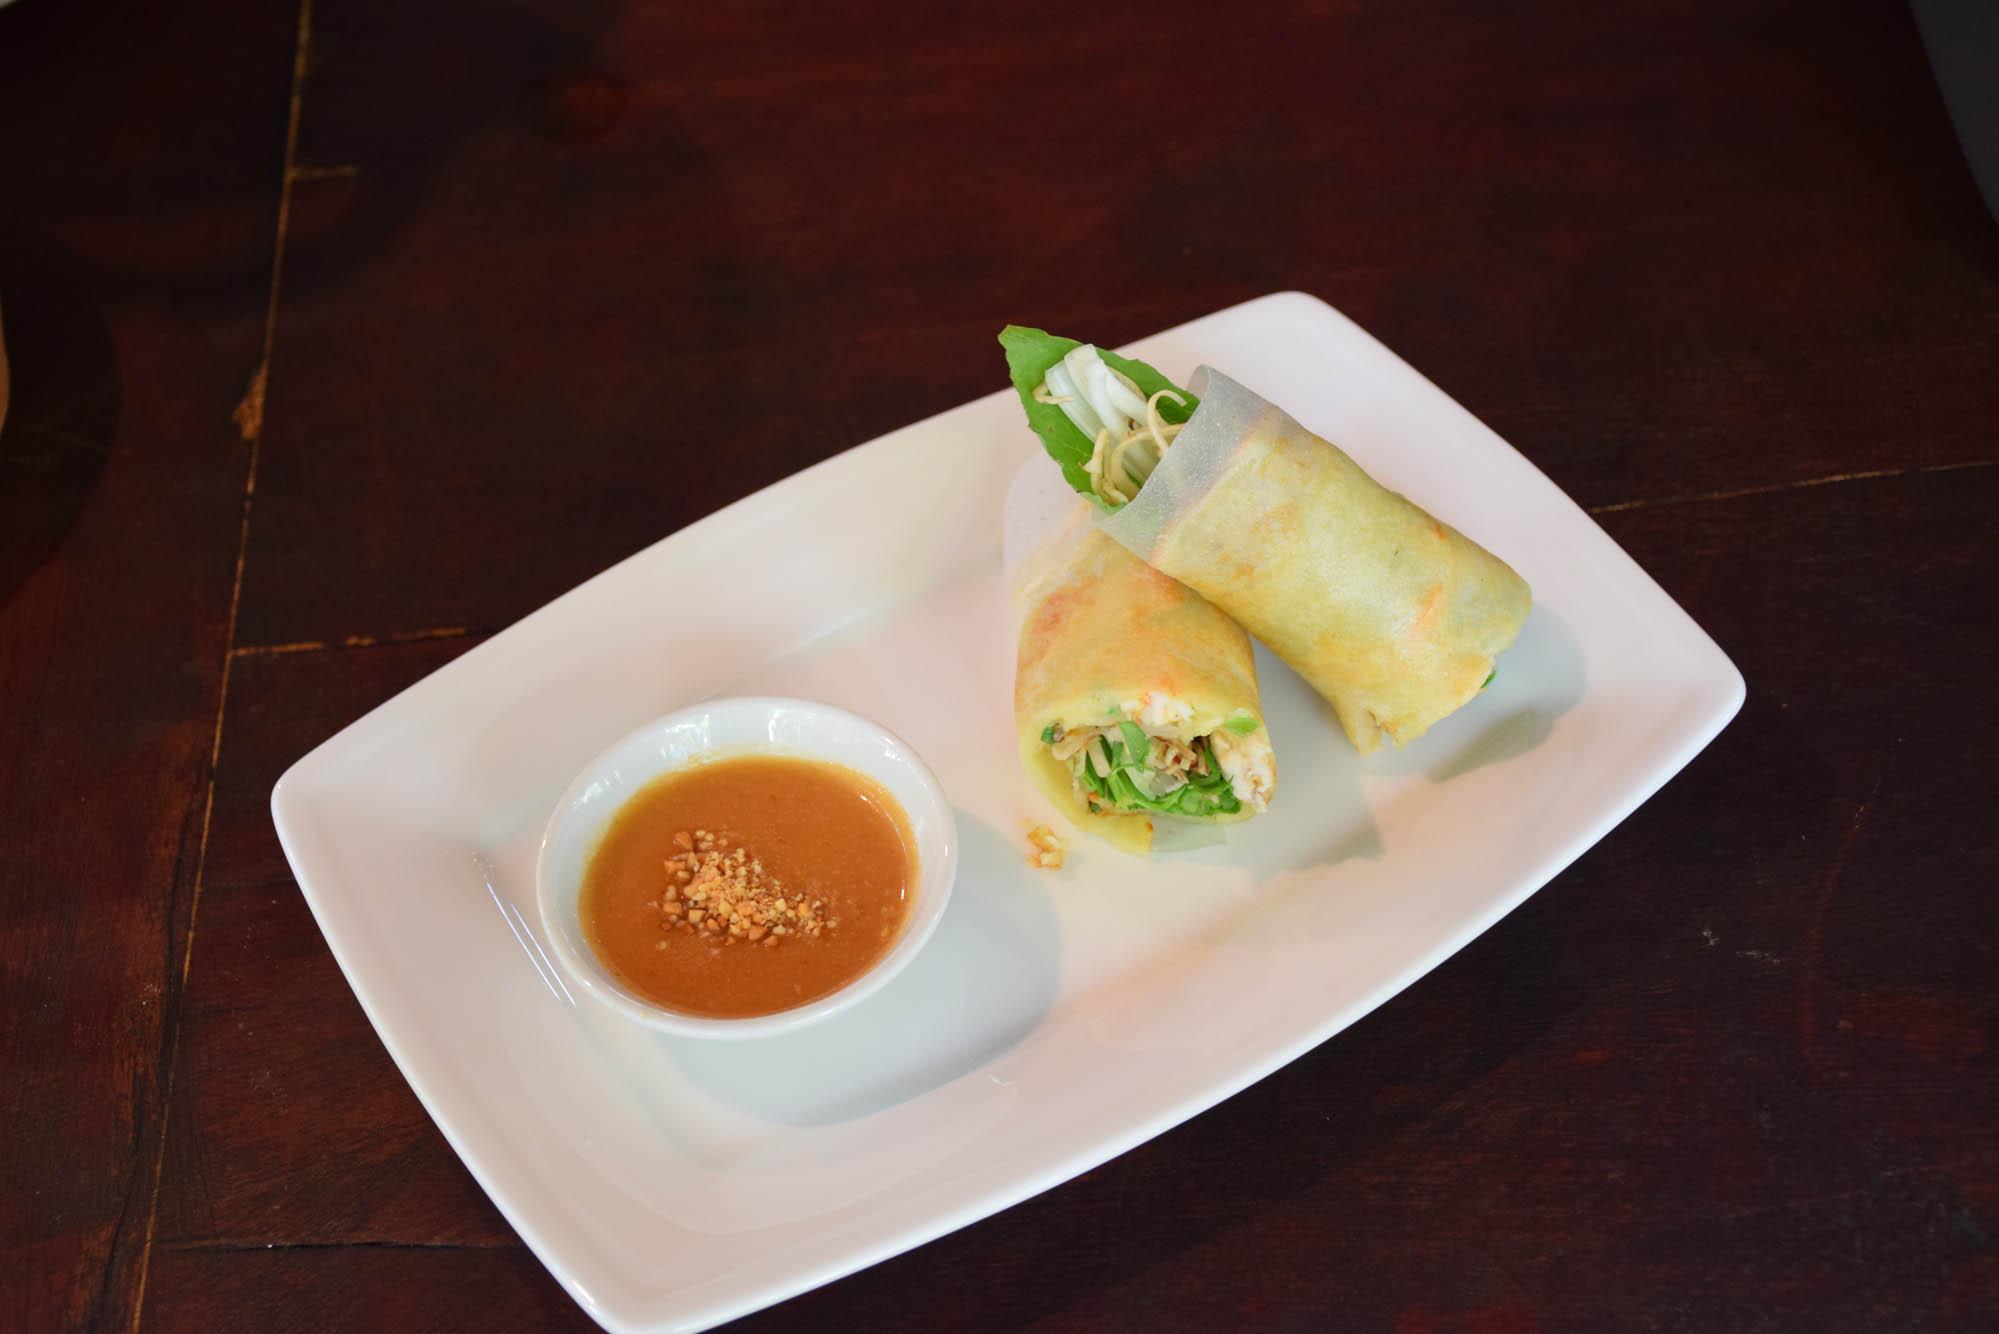 Rolinhos primavera vietnamitas (com papel de arroz)